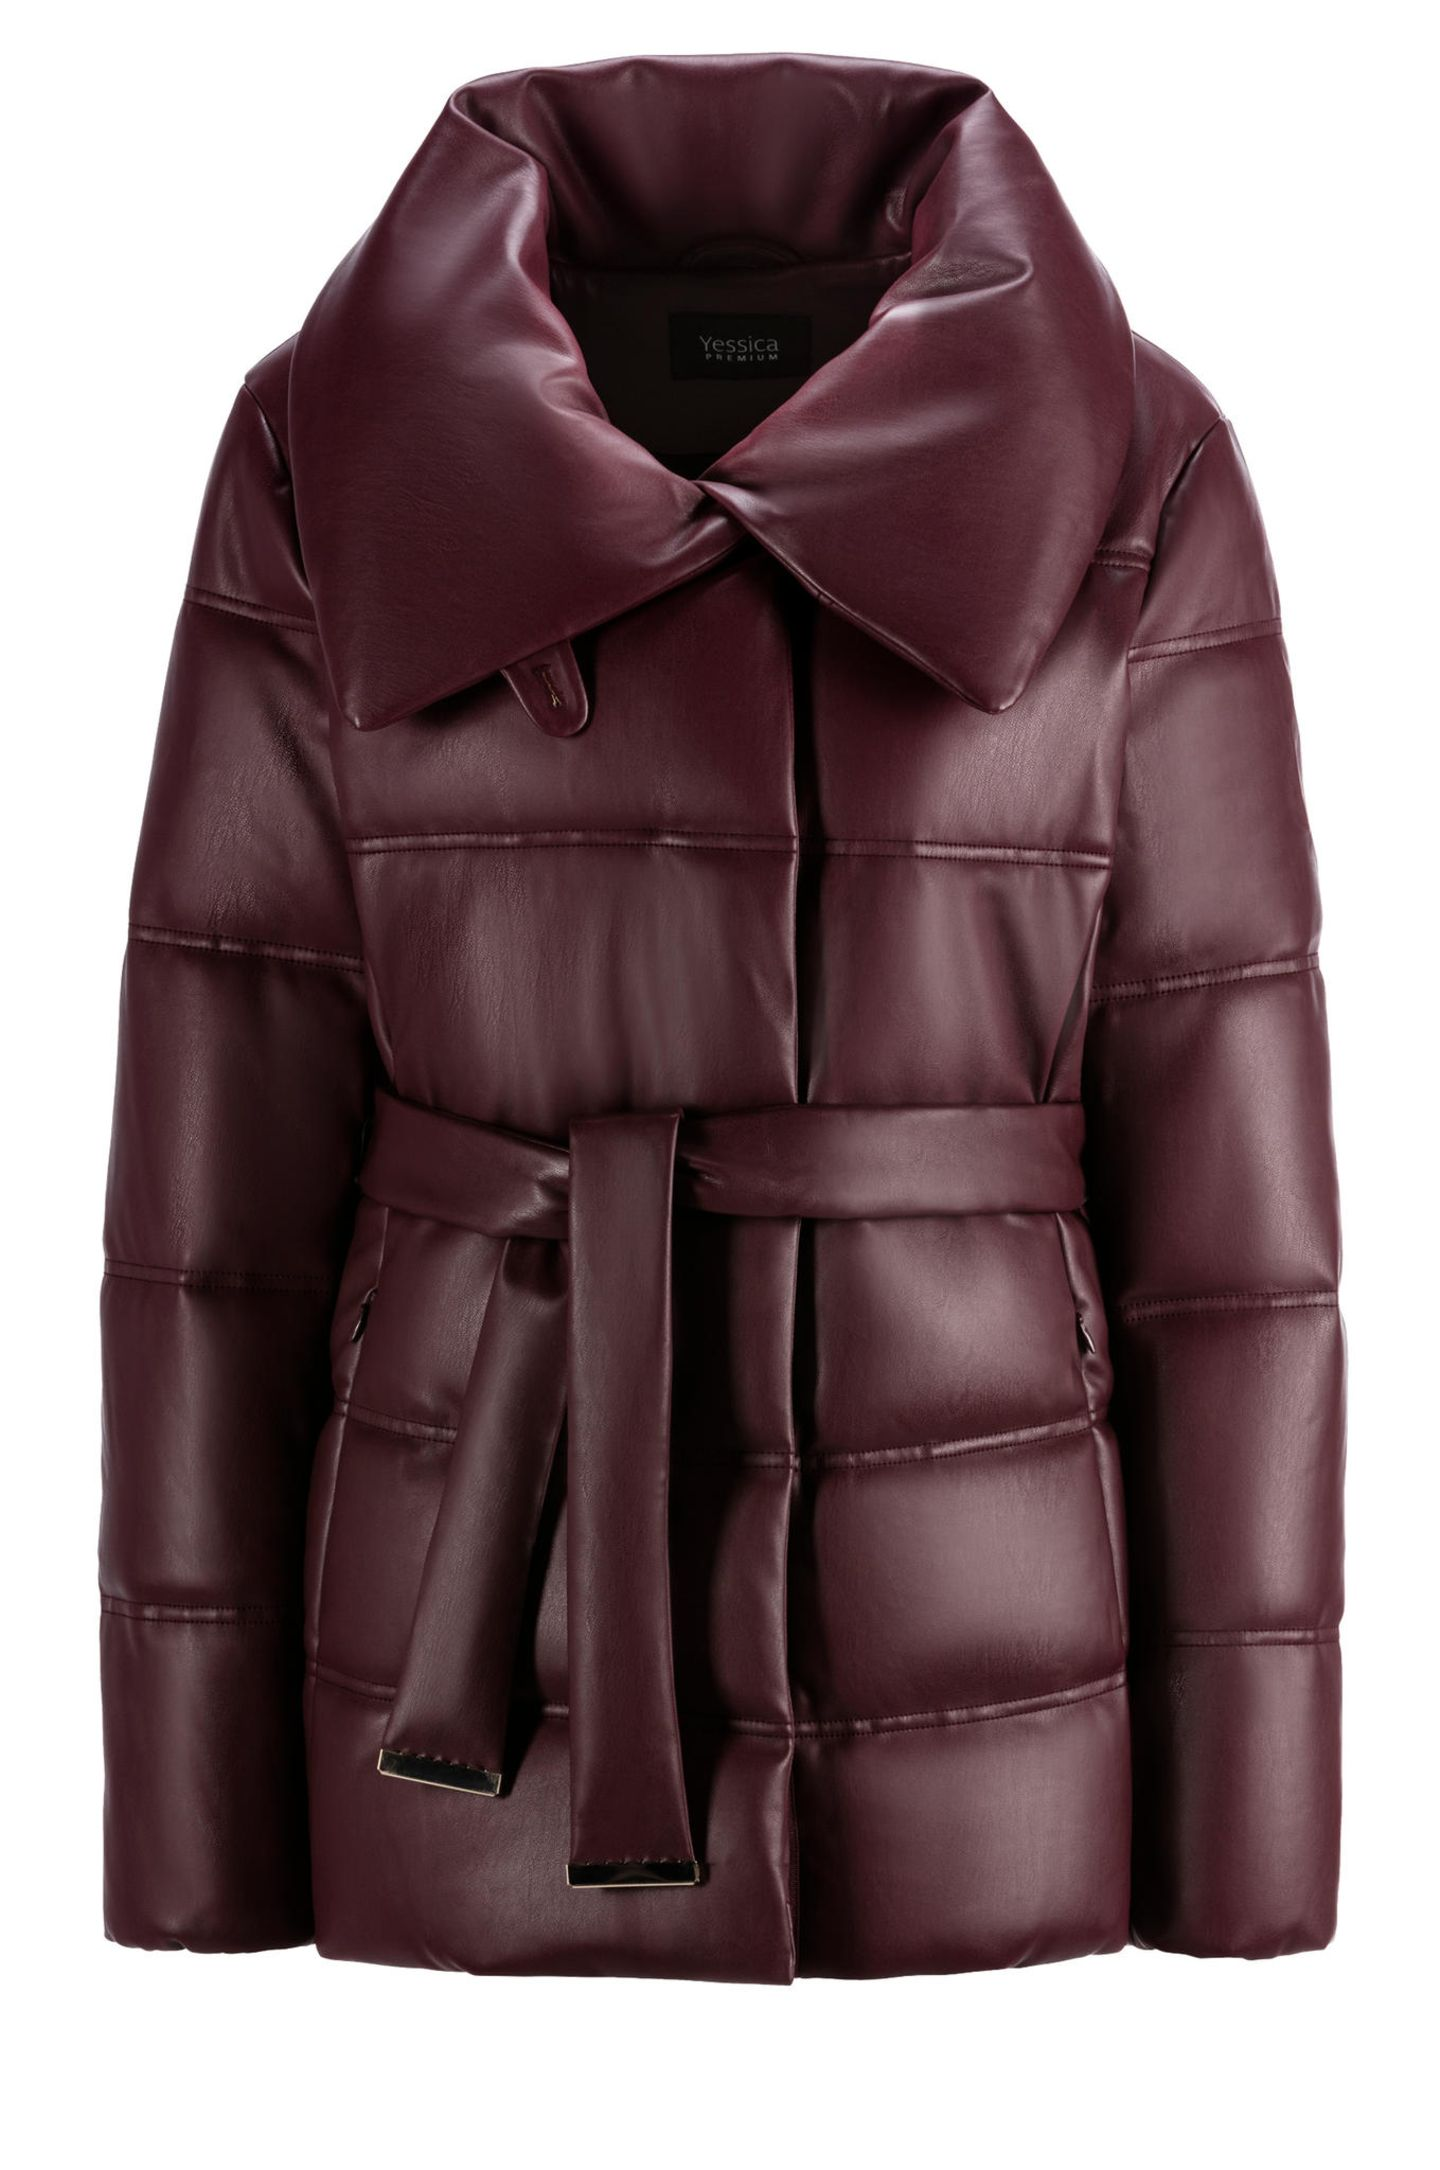 Partylooks für jedes Alter: Jacke in Lederoptik